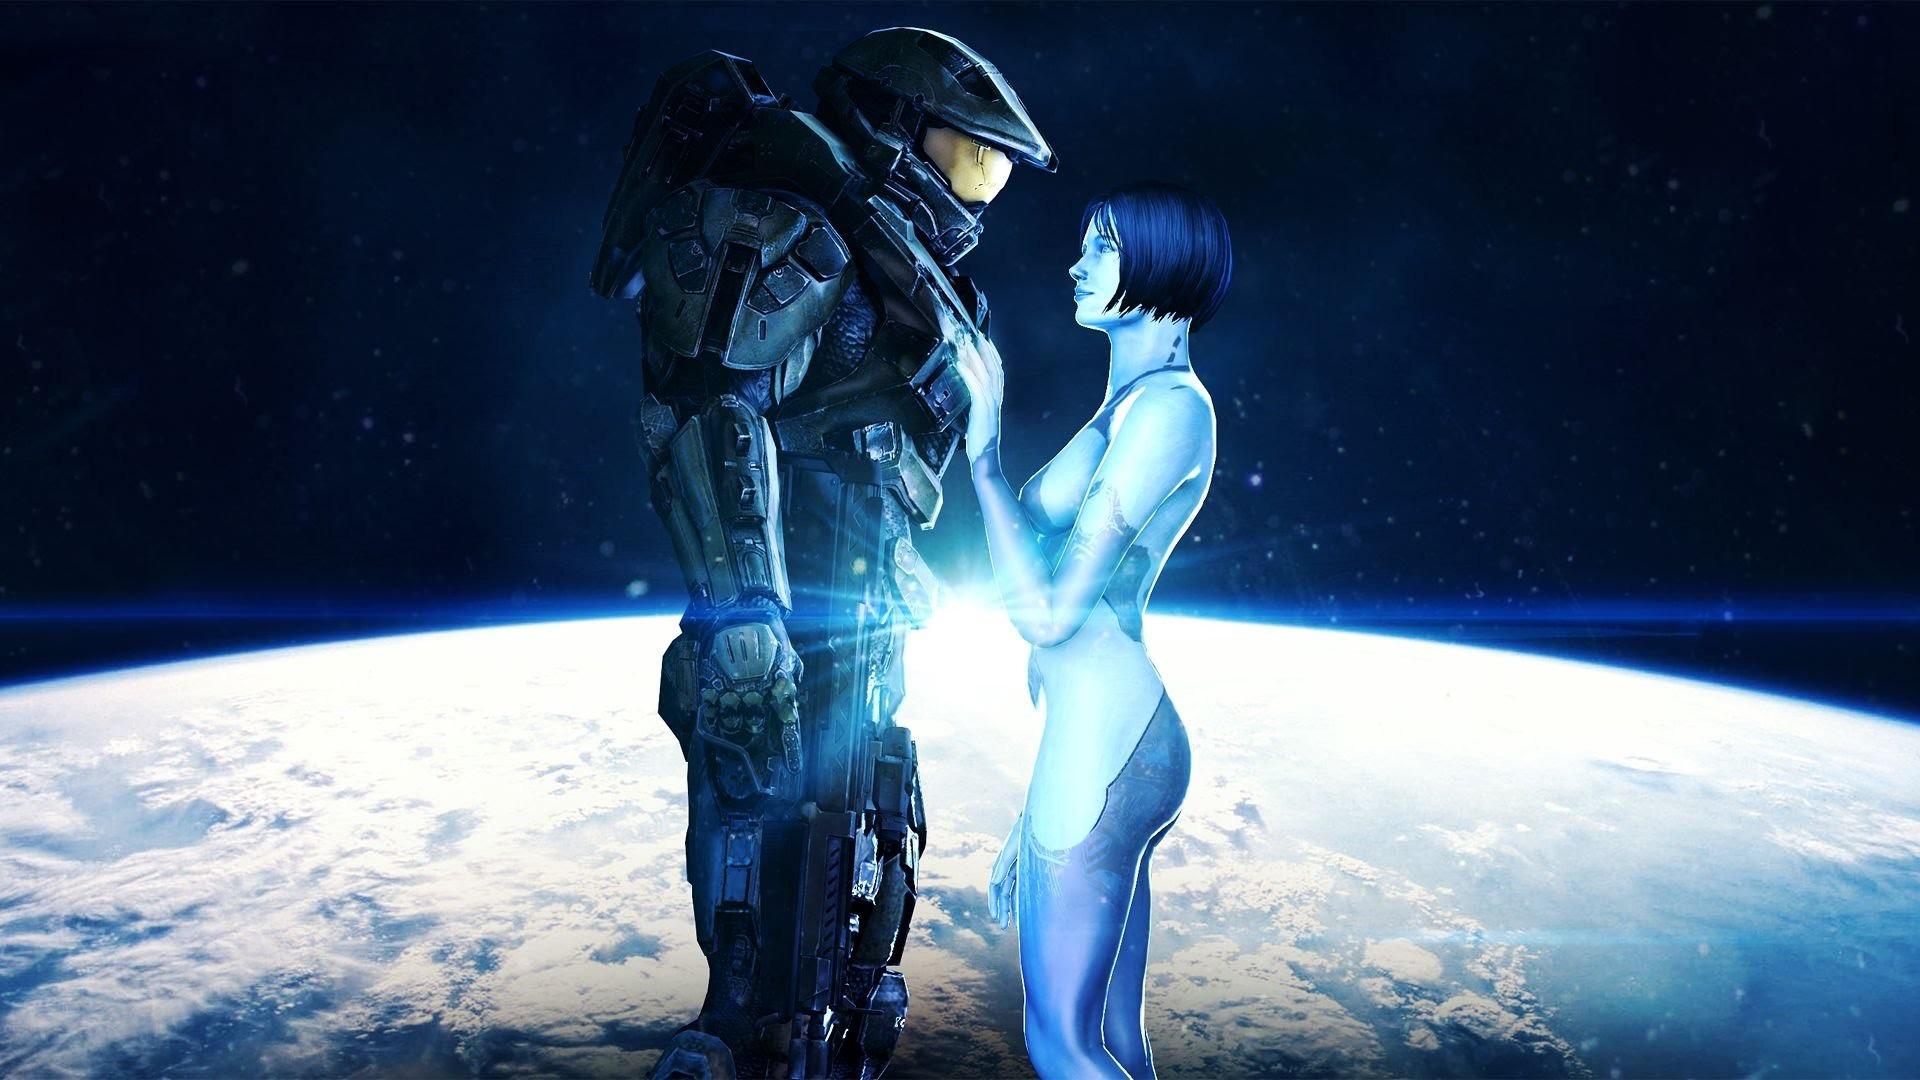 Halo 5 cortana wallpaper 81 images - Halo 4 photos ...